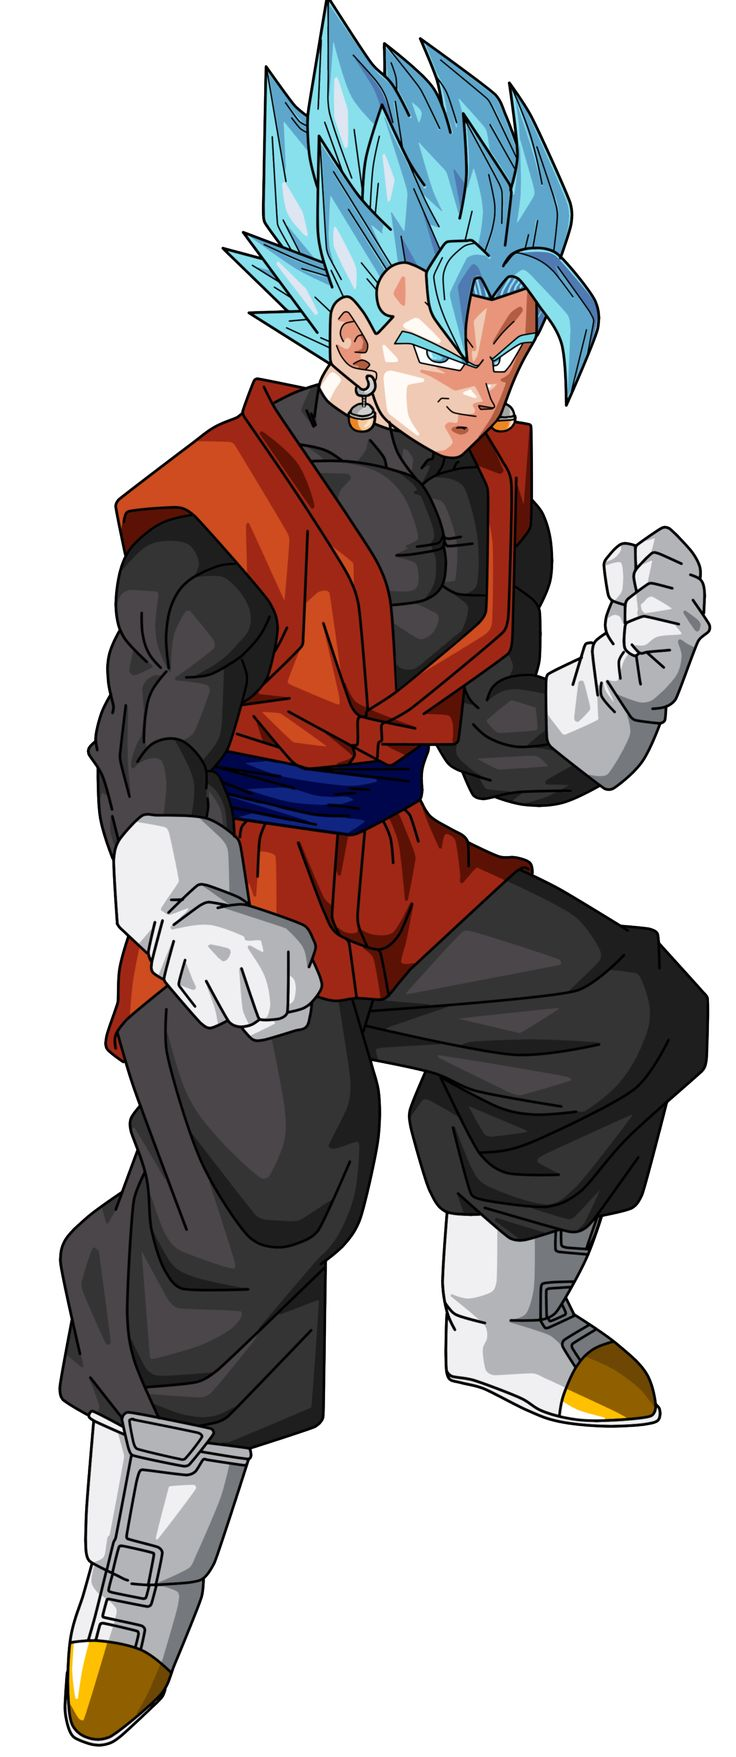 Vegetto Ssj Dios - Visit now for 3D Dragon Ball Z compression shirts now on sale! #dragonball #dbz #dragonballsuper